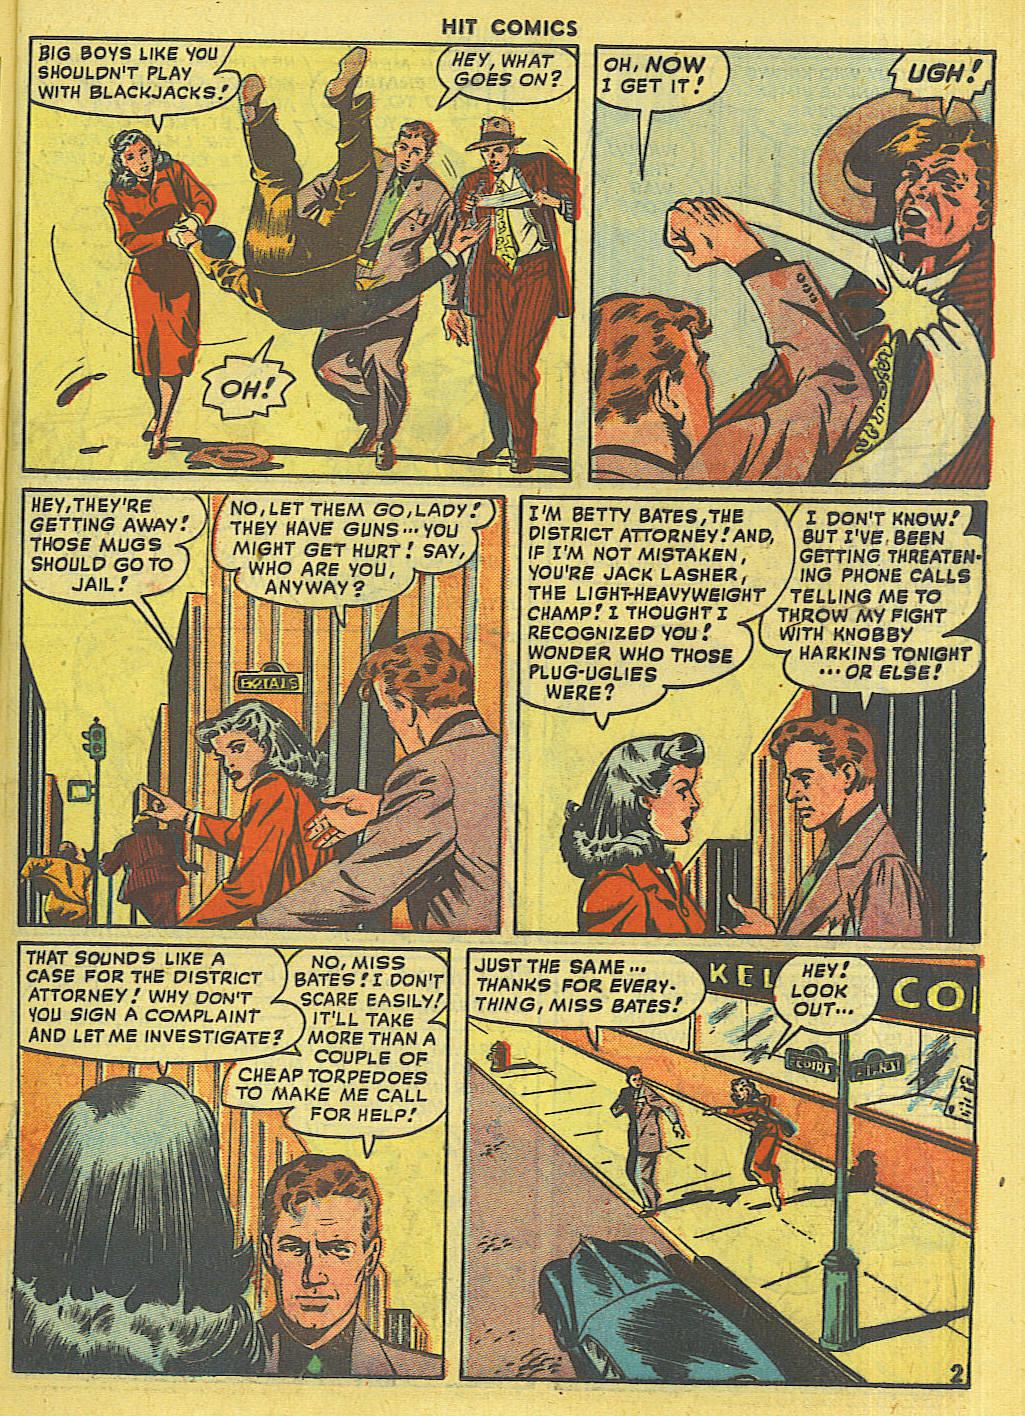 Read online Hit Comics comic -  Issue #56 - 33